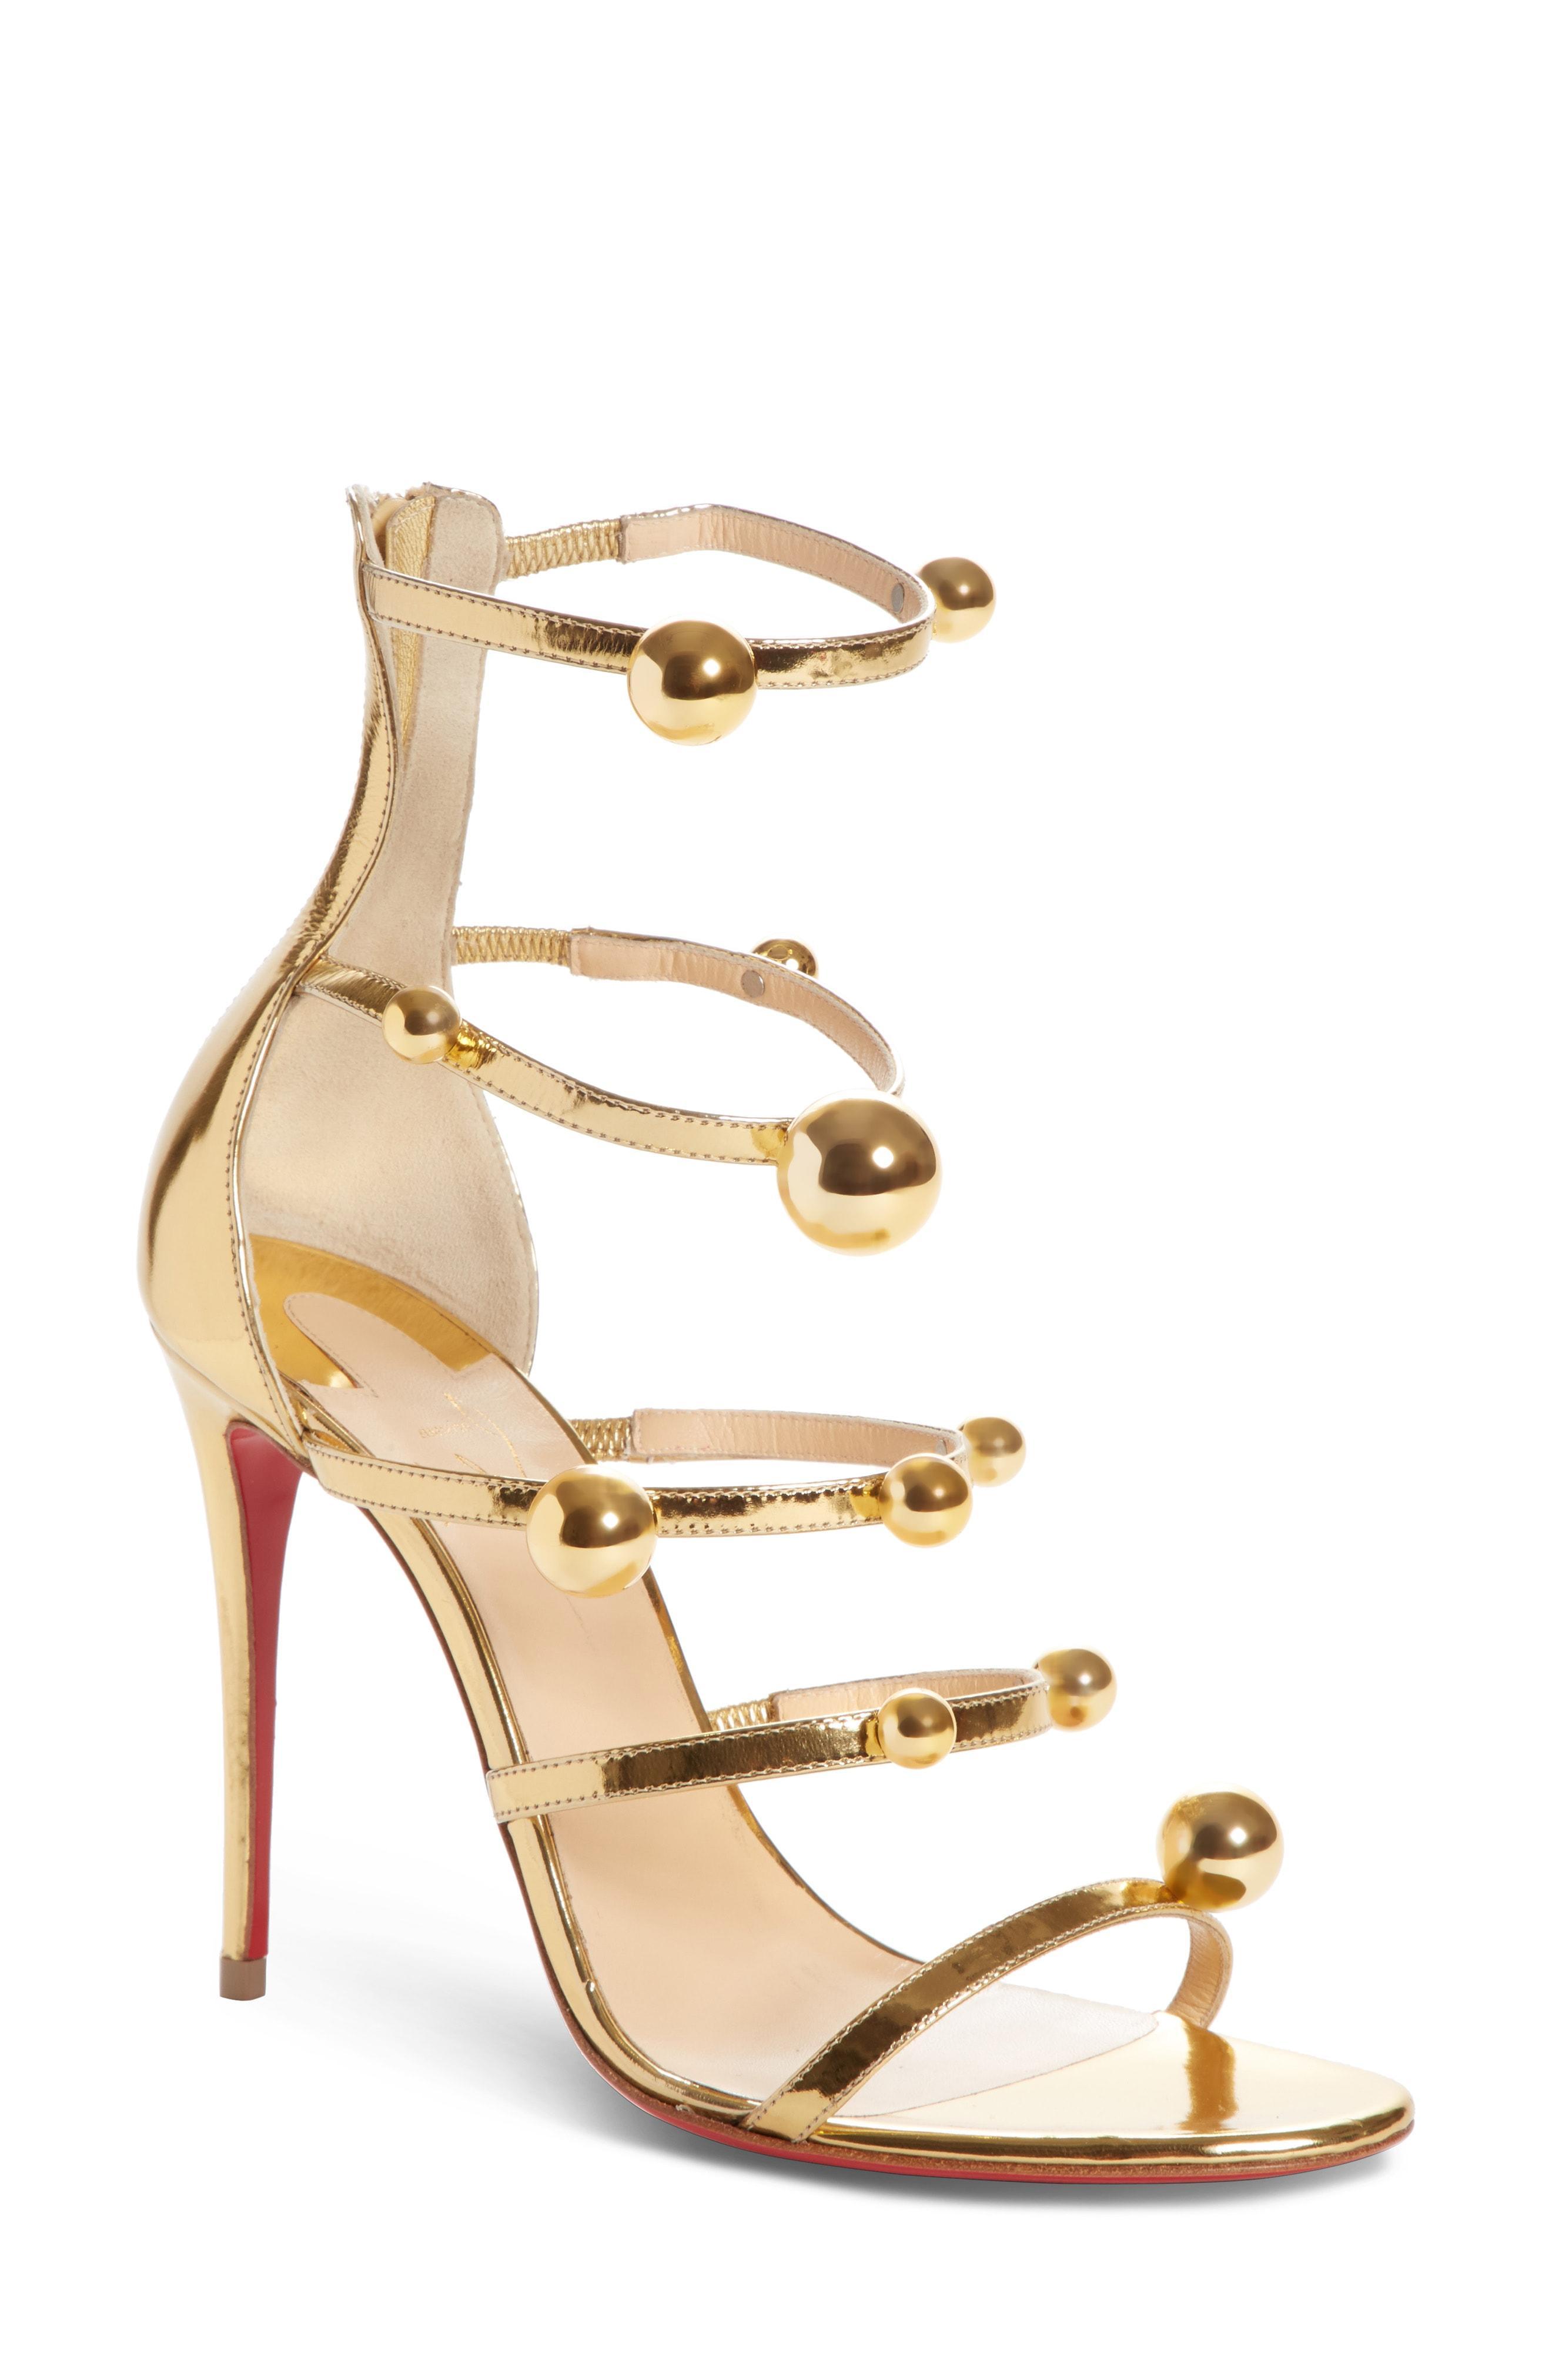 abfd24d2871a Christian Louboutin Atonana Specchio Ball Red Sole Sandal In Gold ...